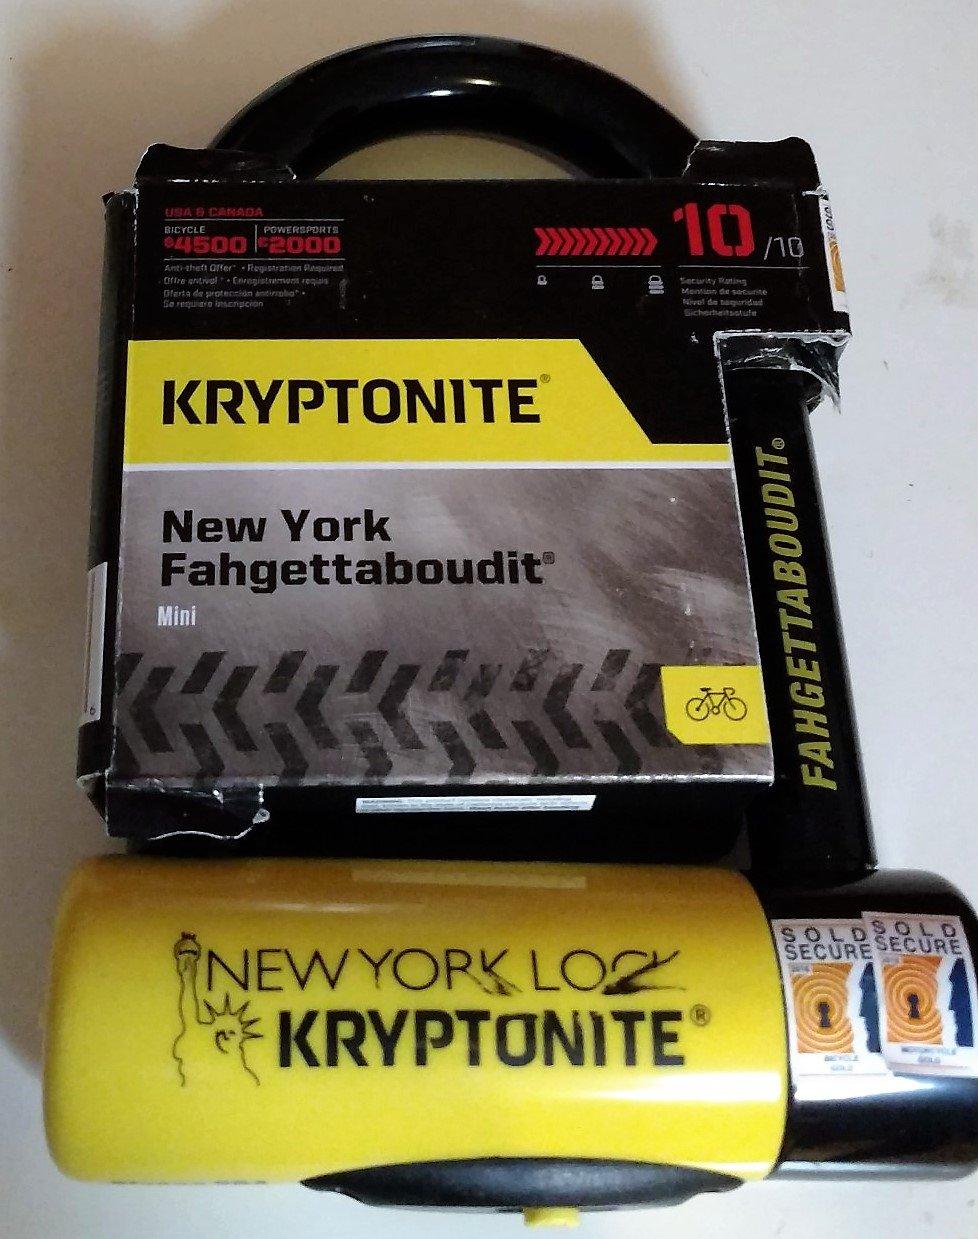 Kryptonite Mini antivol New York Fahgettaboudit product image